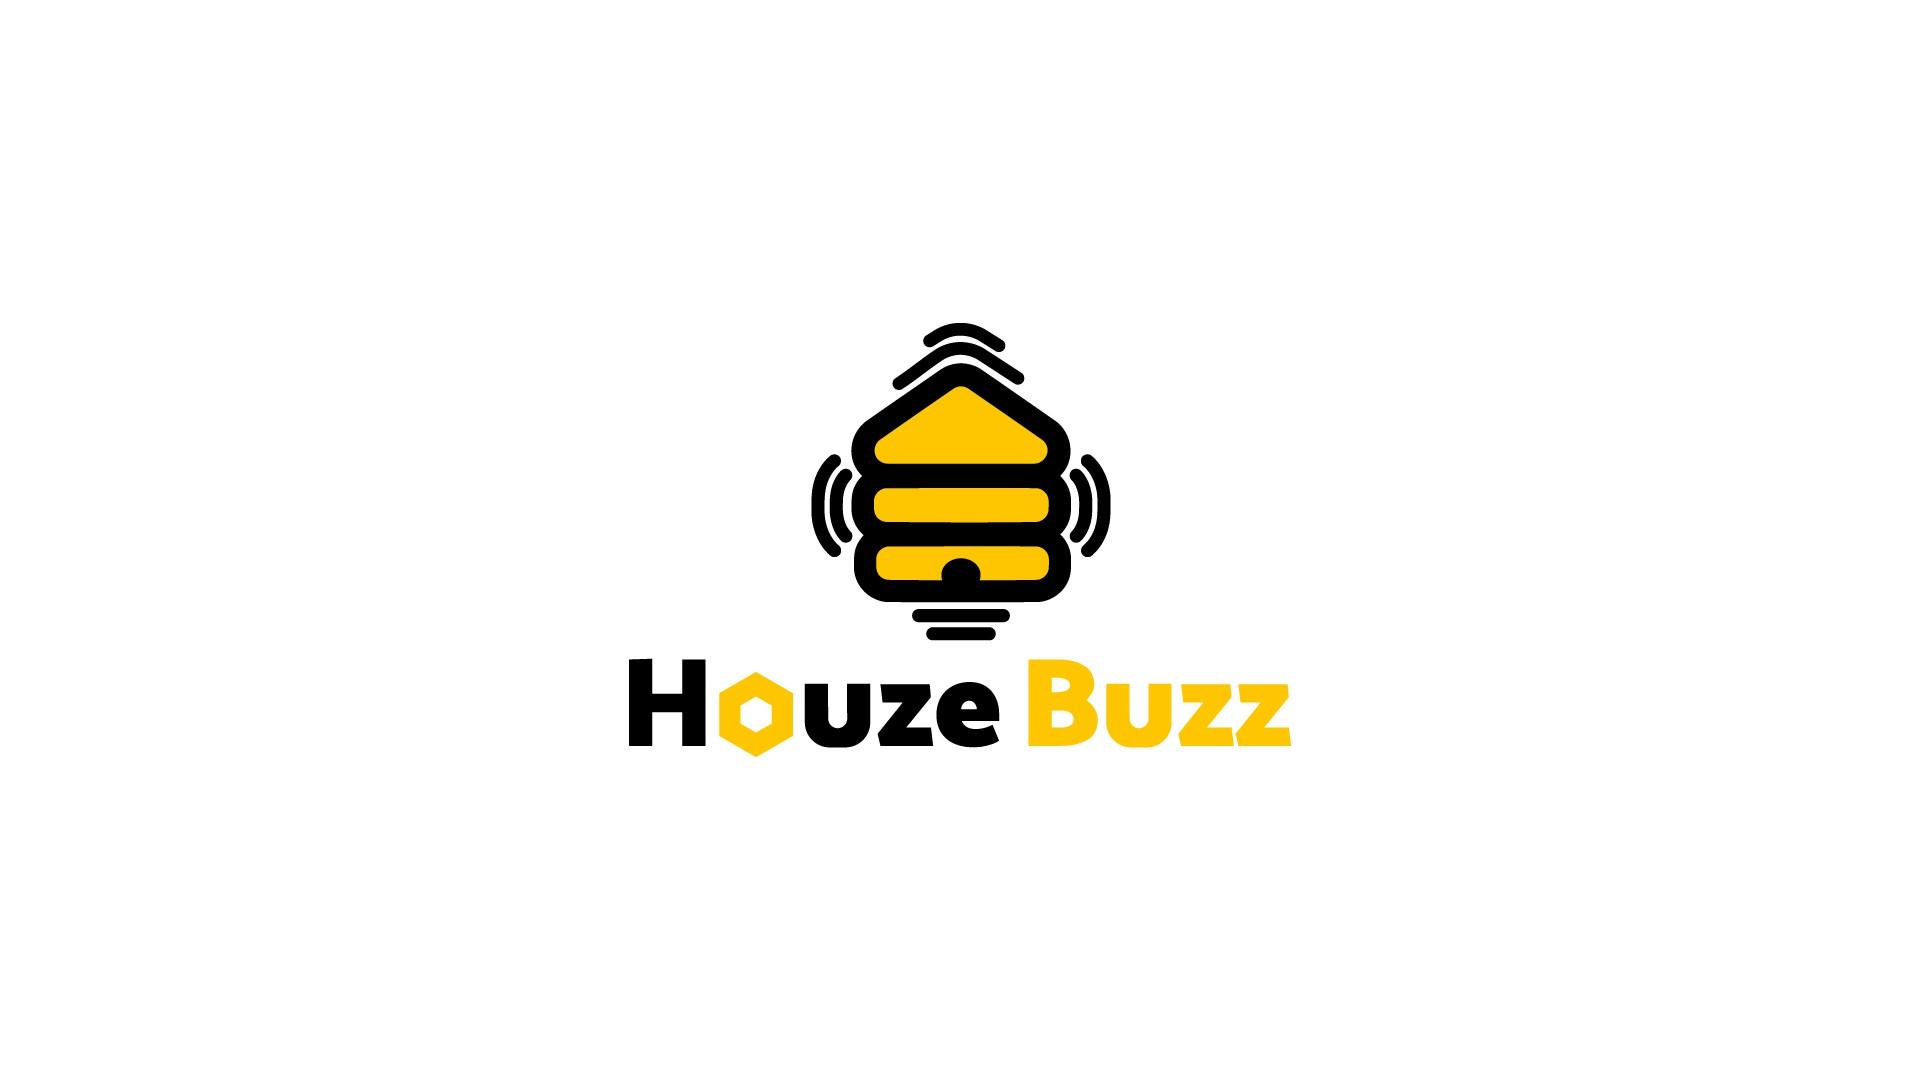 Houze Buzz Logo Design